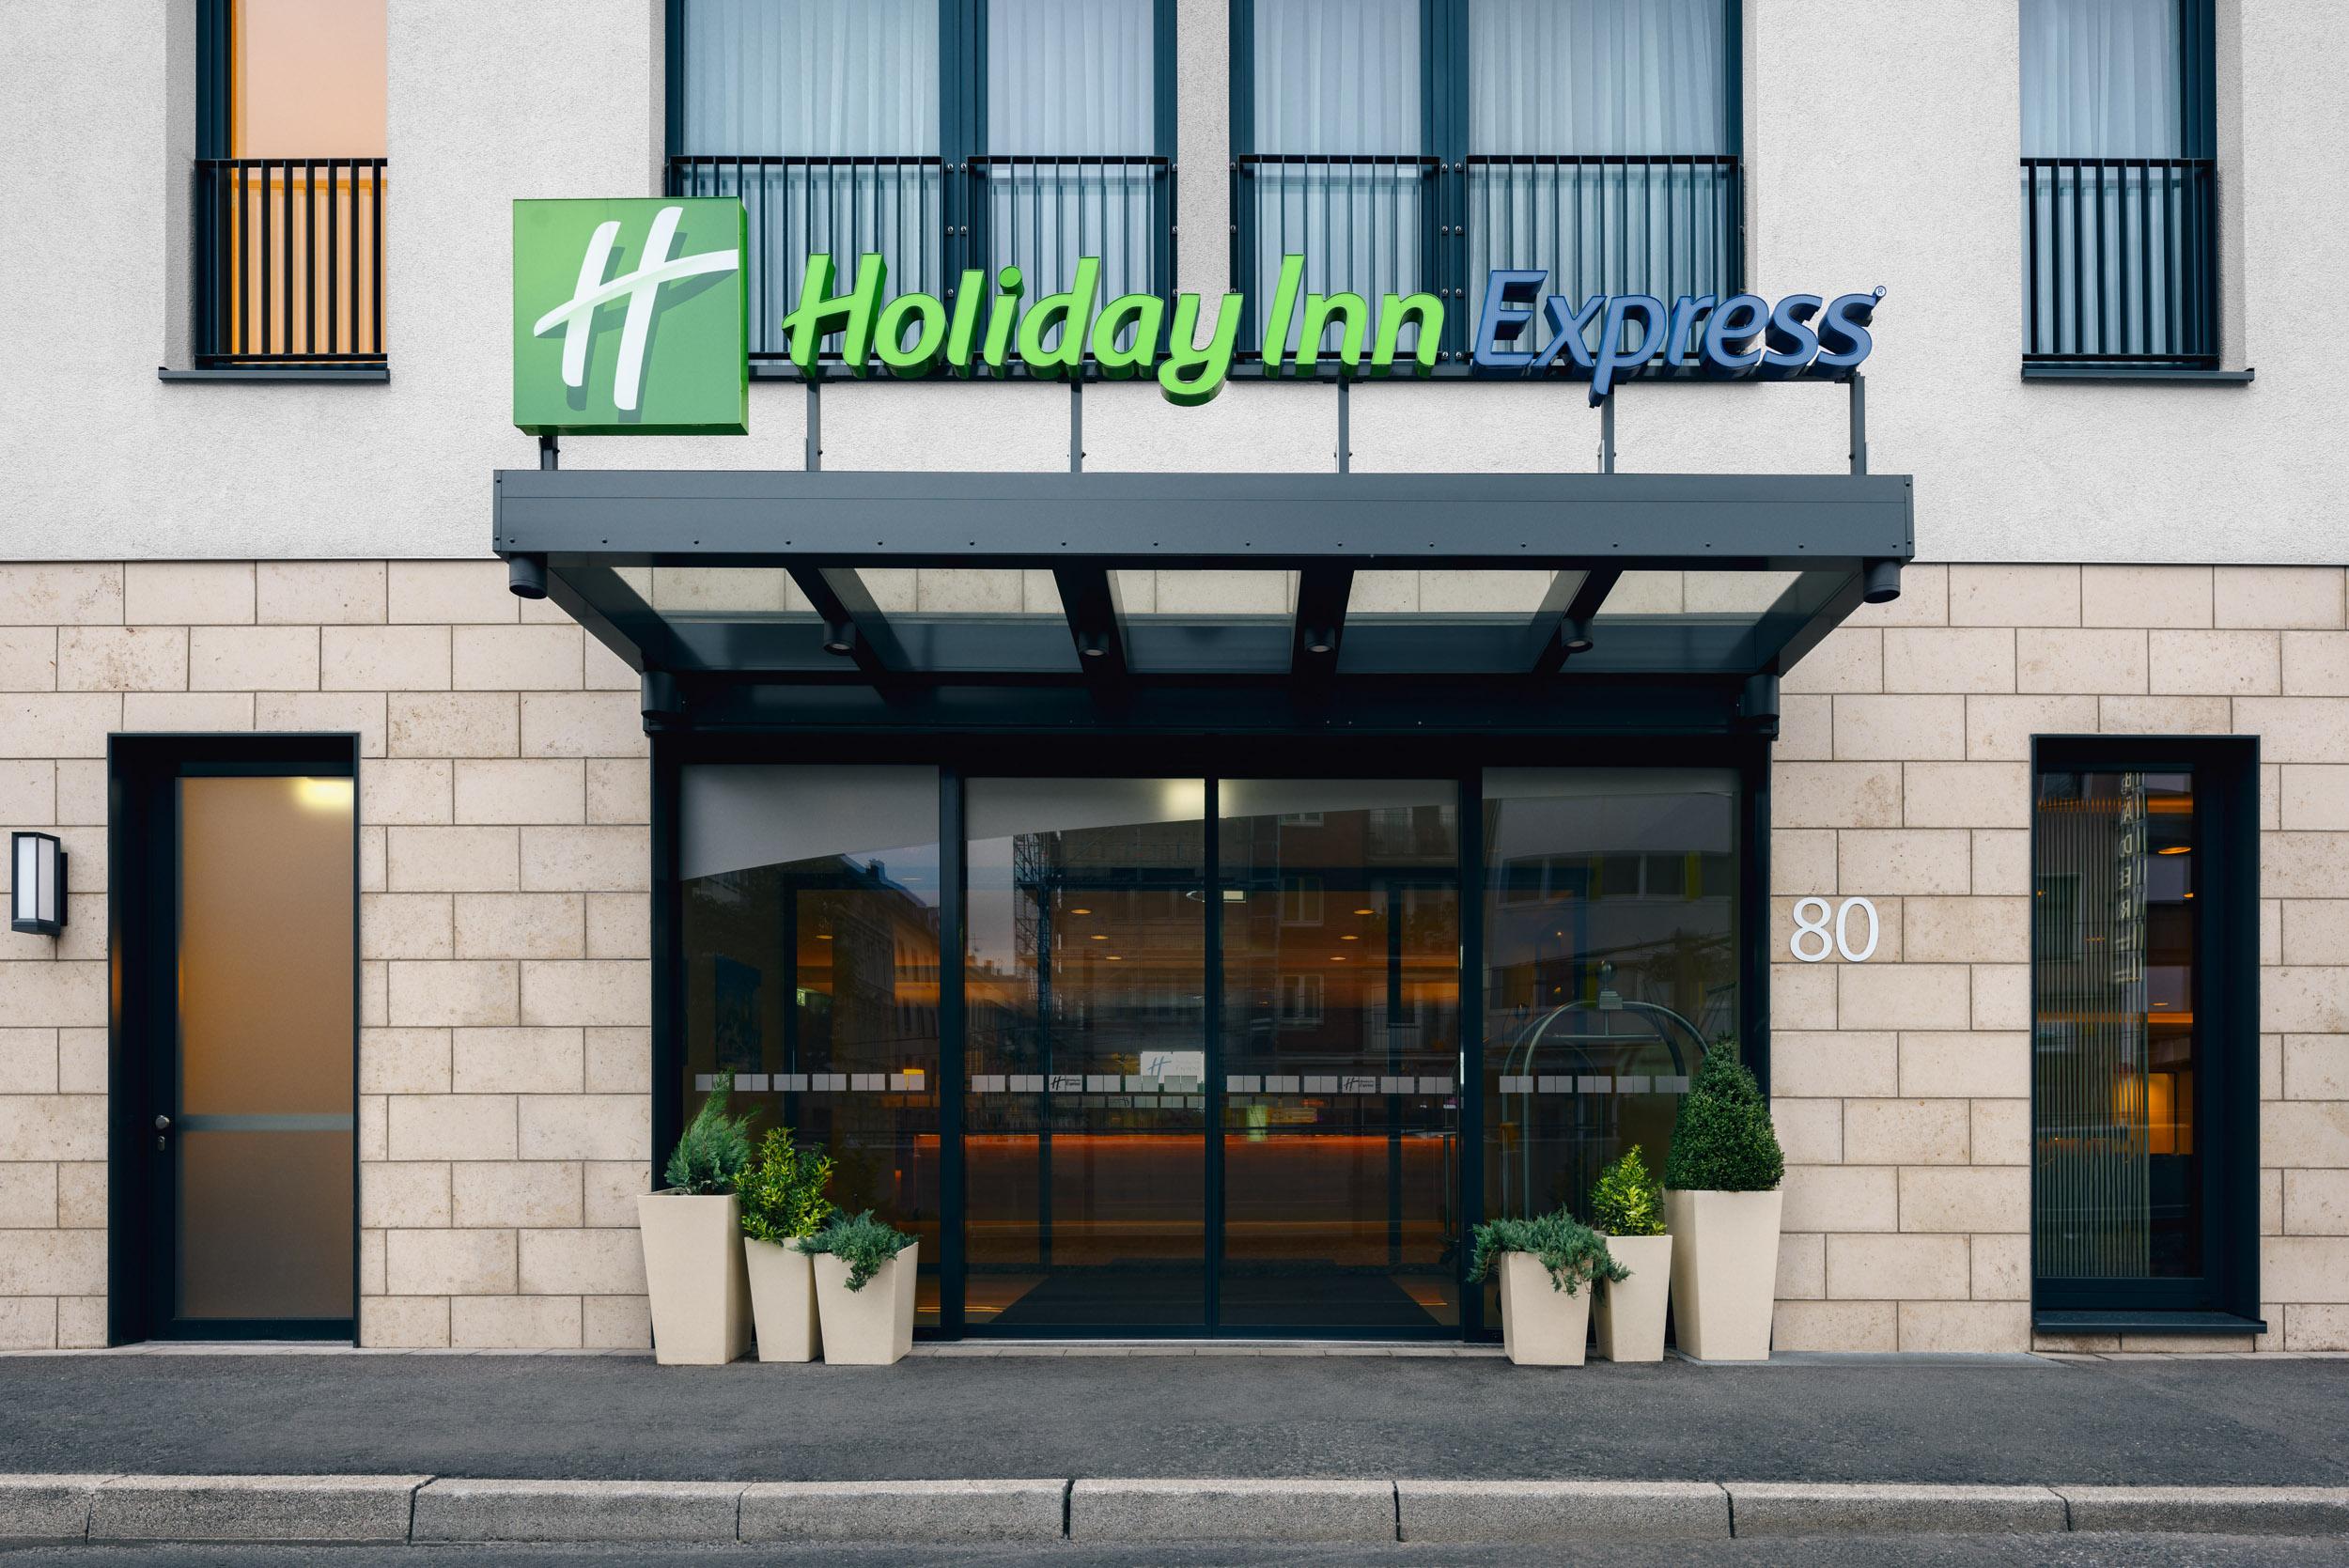 Gustav-Epple-Bauunternehmung-Holiday-Inn-Duesseldorf-MLX6996